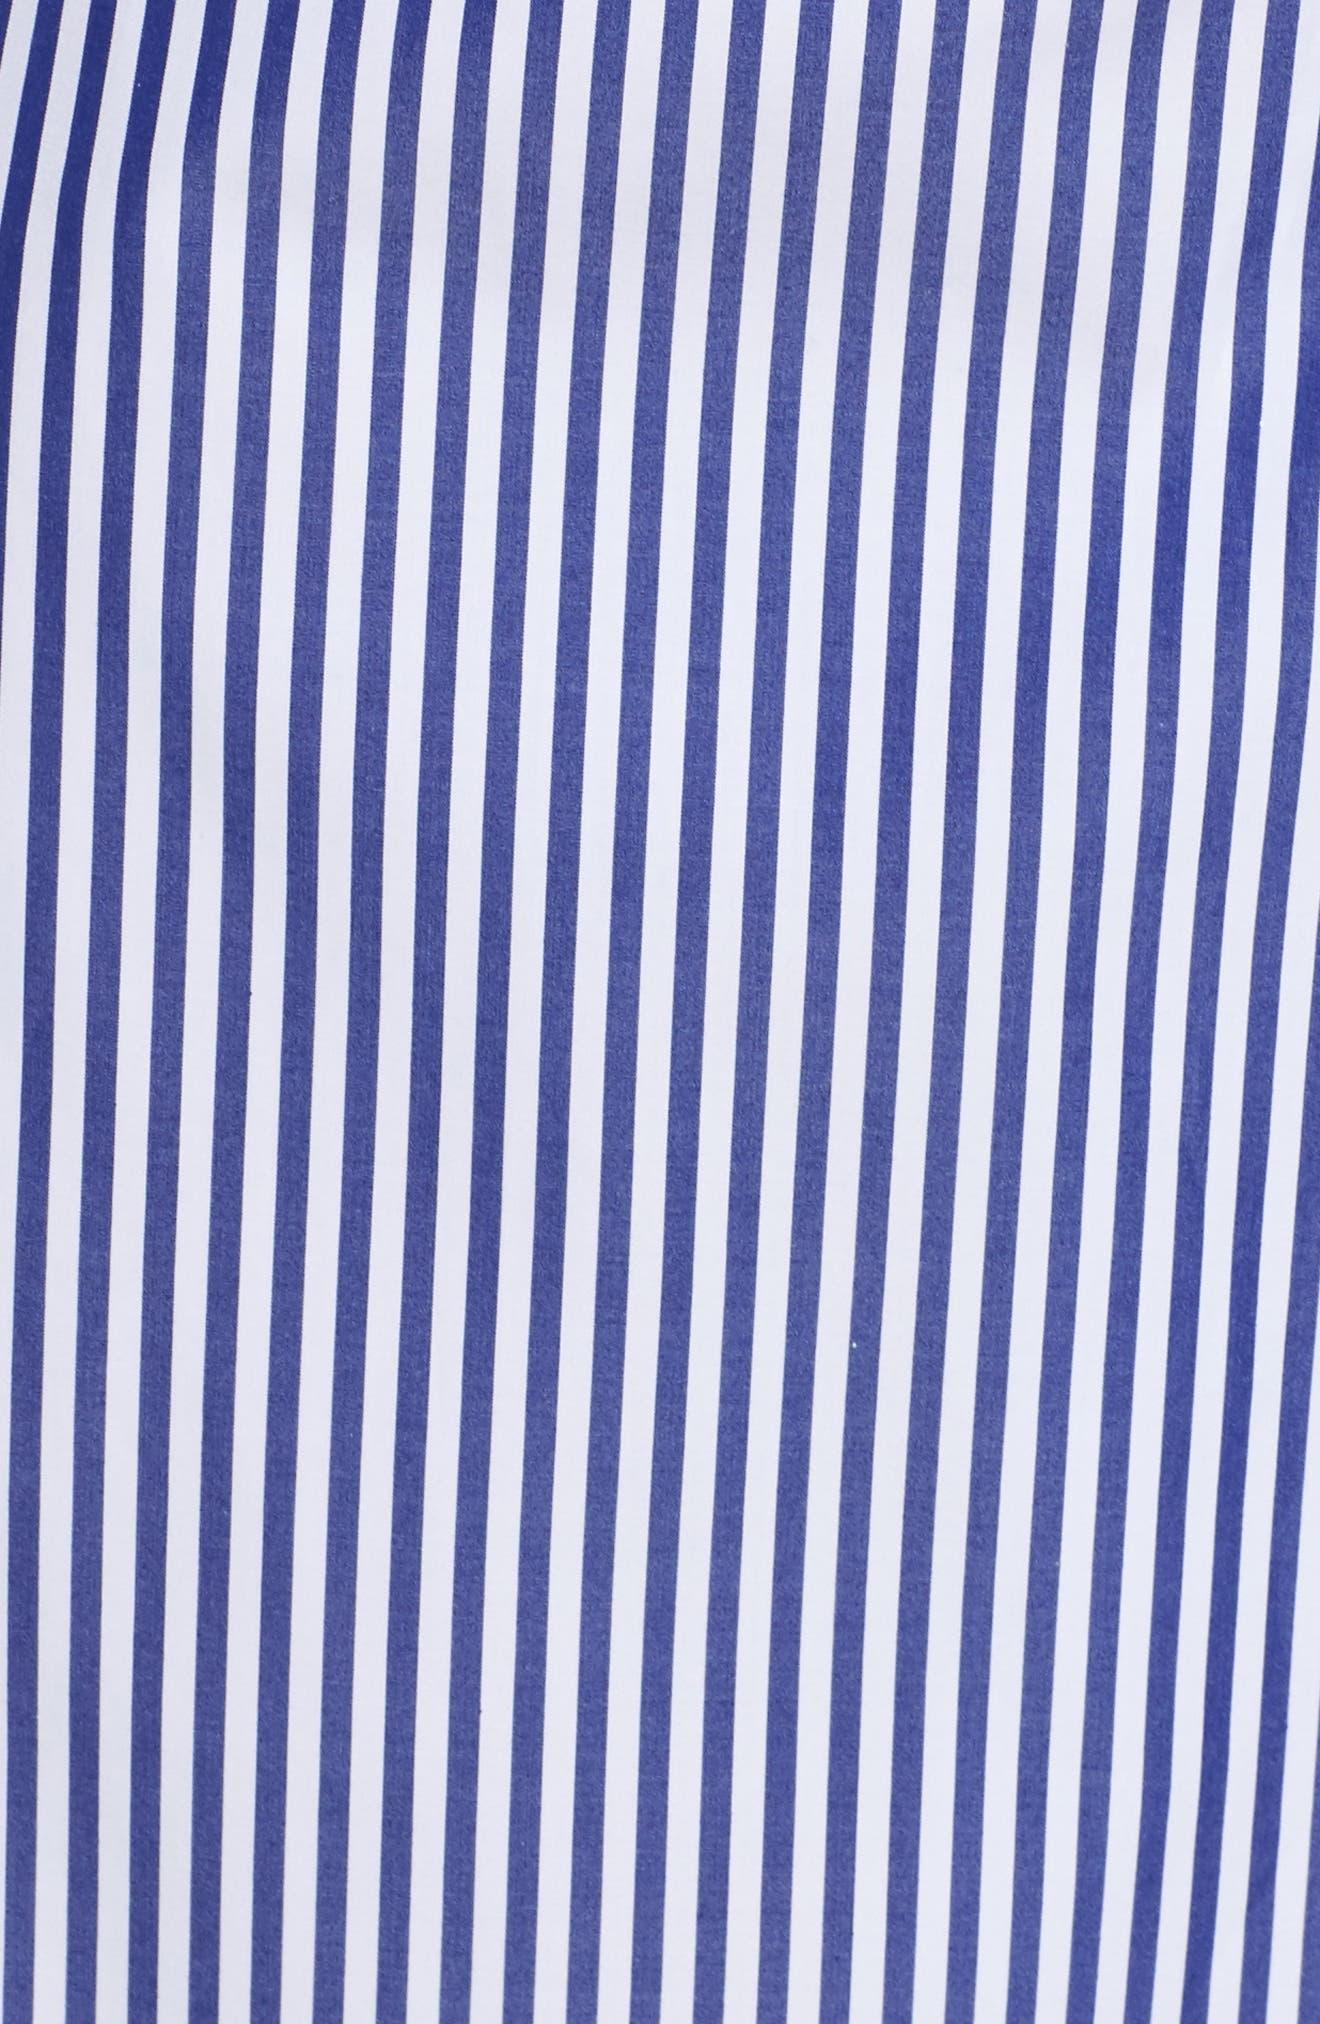 Alternate Image 5  - Pour Les Femmes Stripe Robe